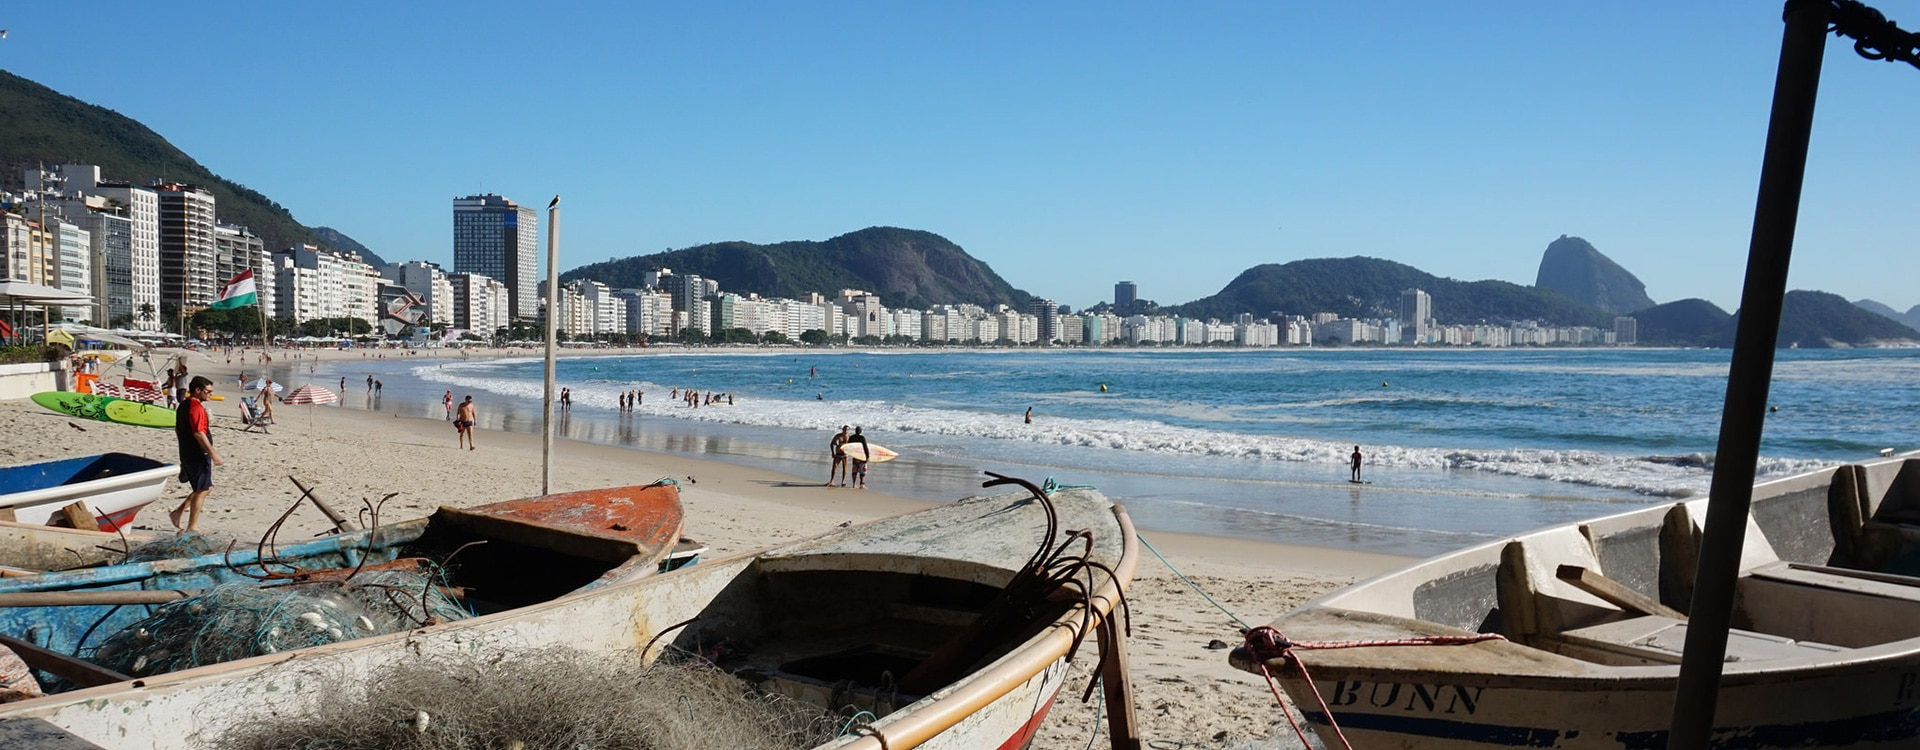 Copacabana Bresil Rio de Janeiro plage